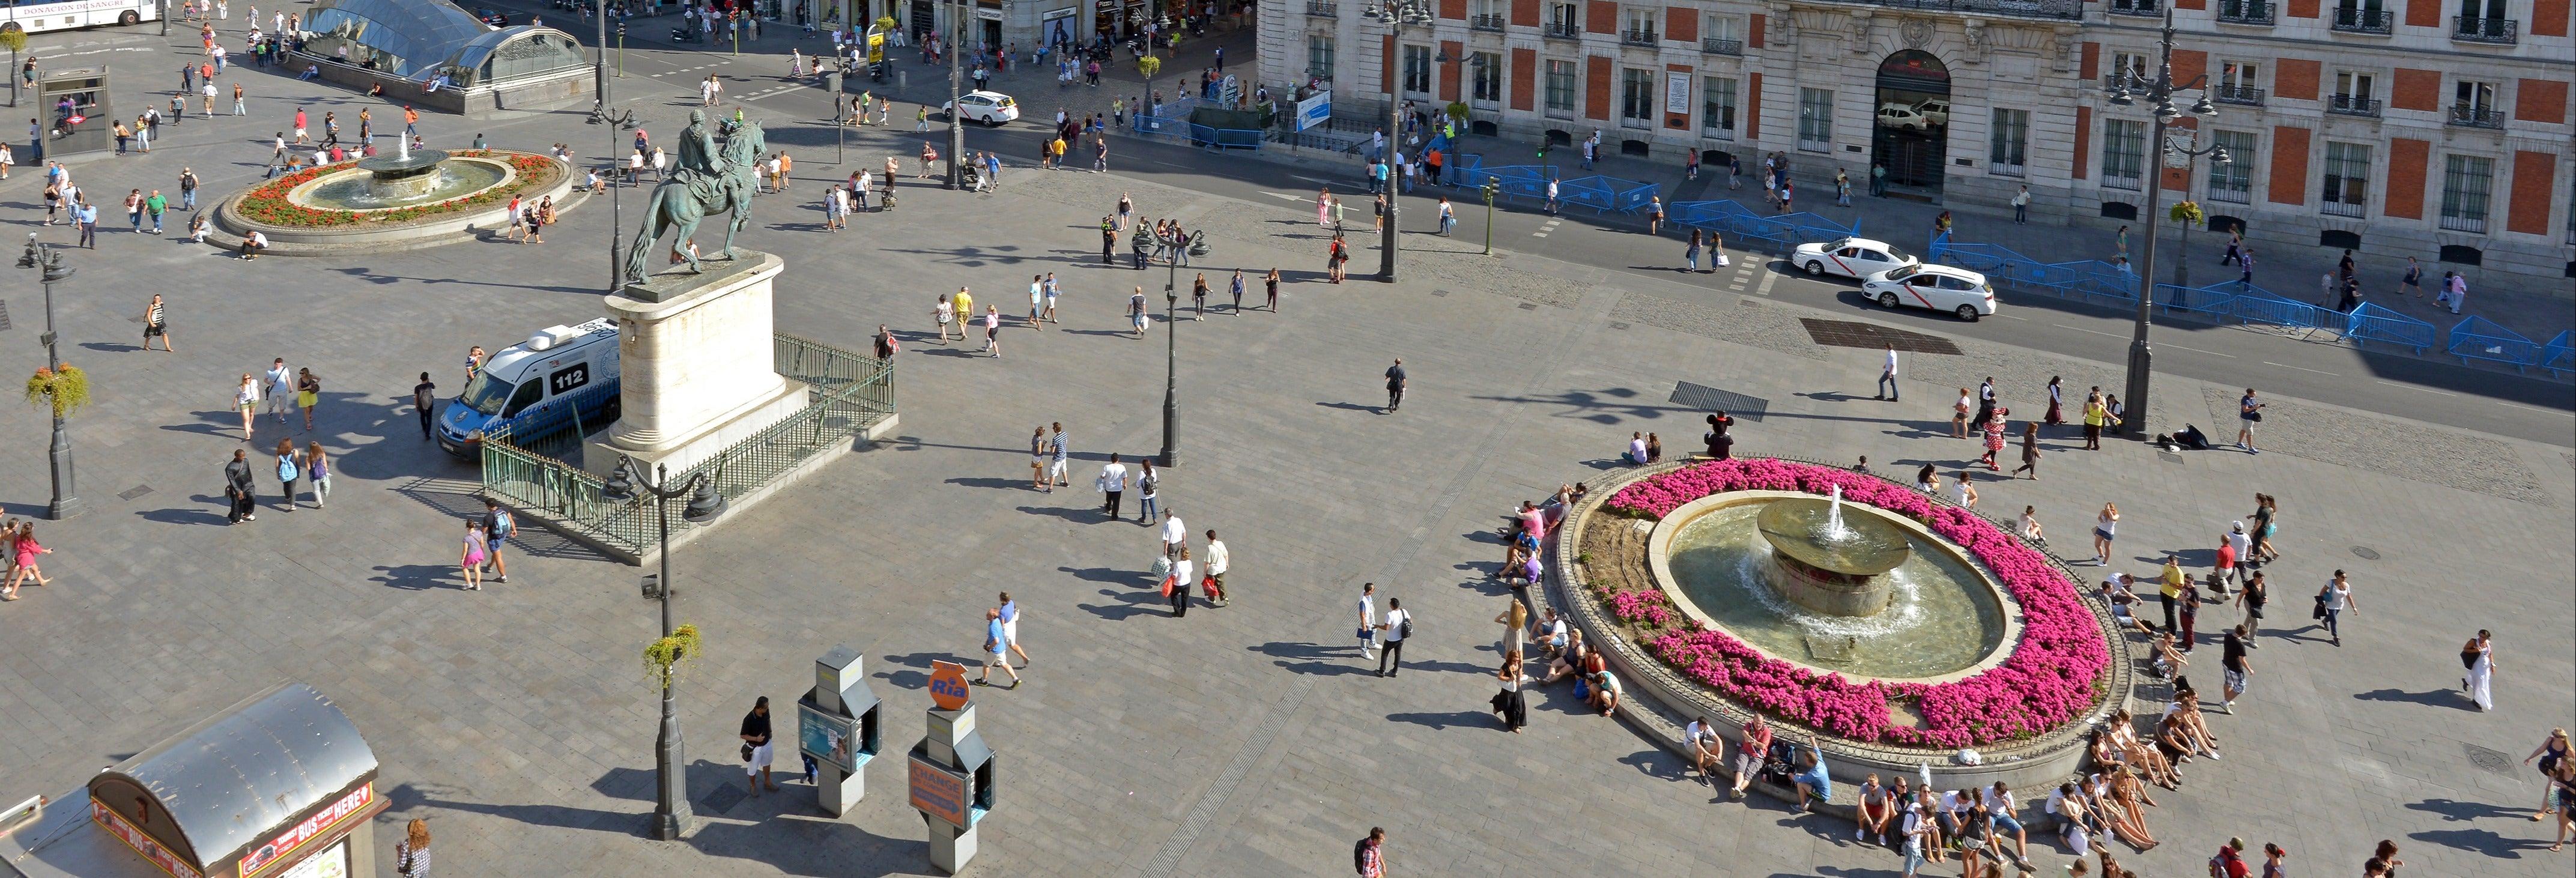 Free tour de las mujeres ilustres de Madrid